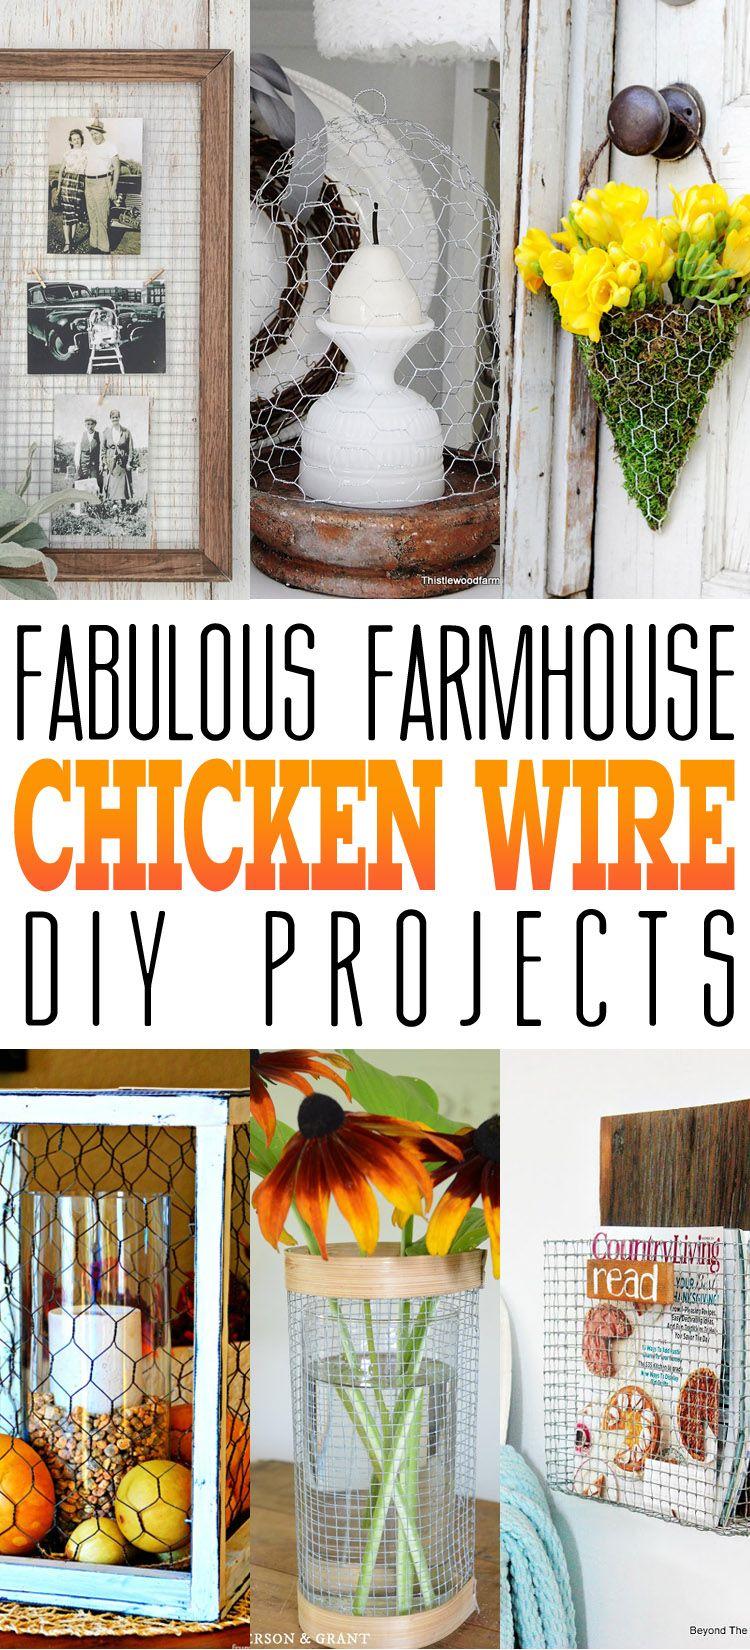 Fabulous Farmhouse Chicken Wire DIY Projects | Best Pins | Chicken